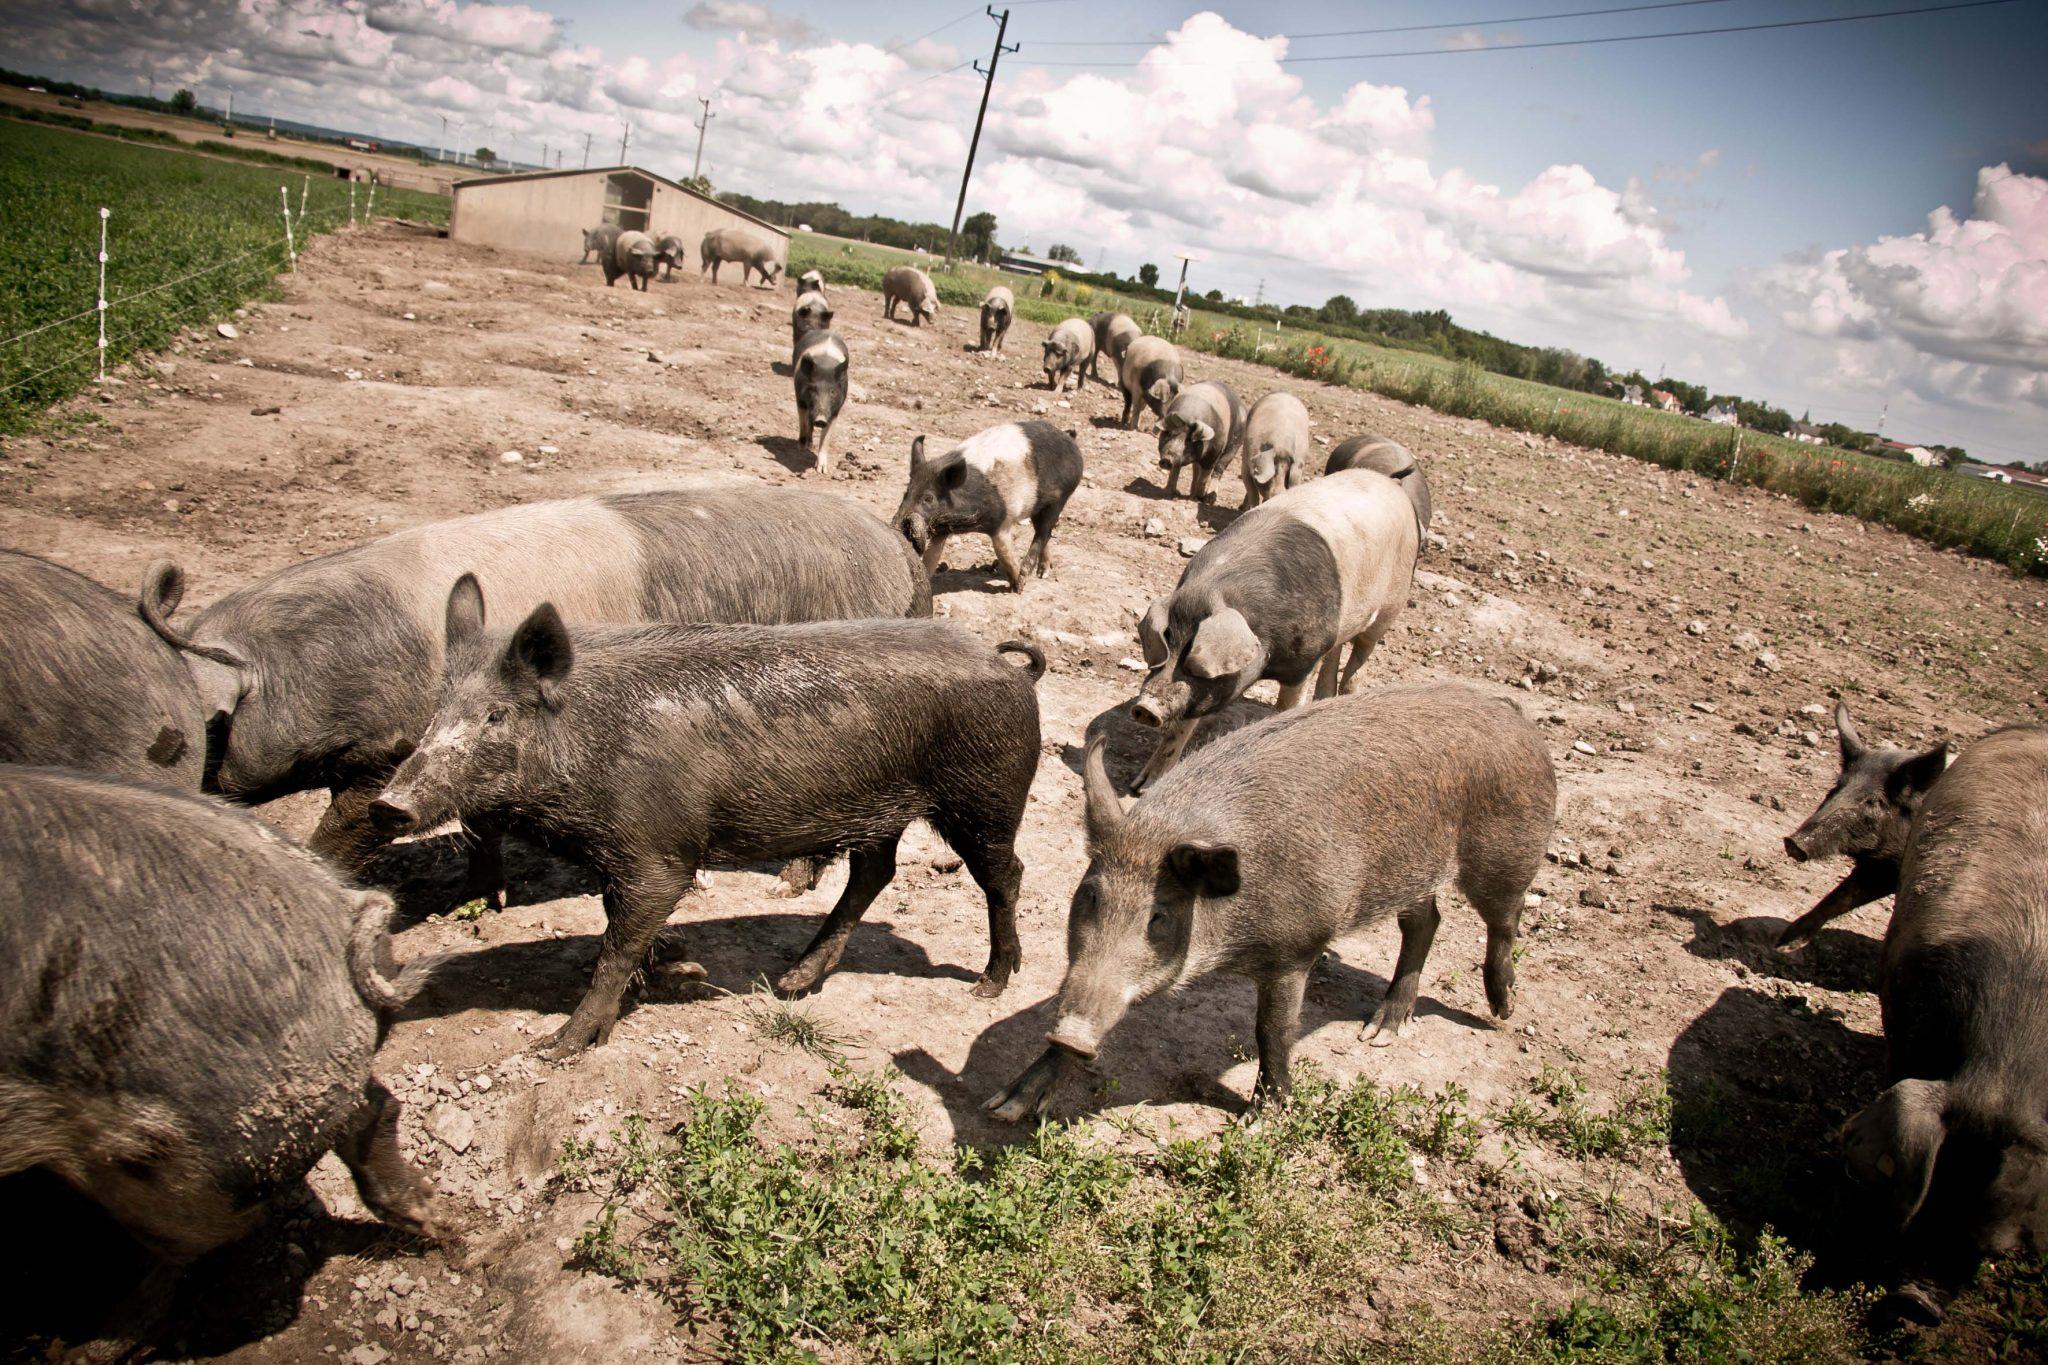 Schweine www.sandrastojkov.com